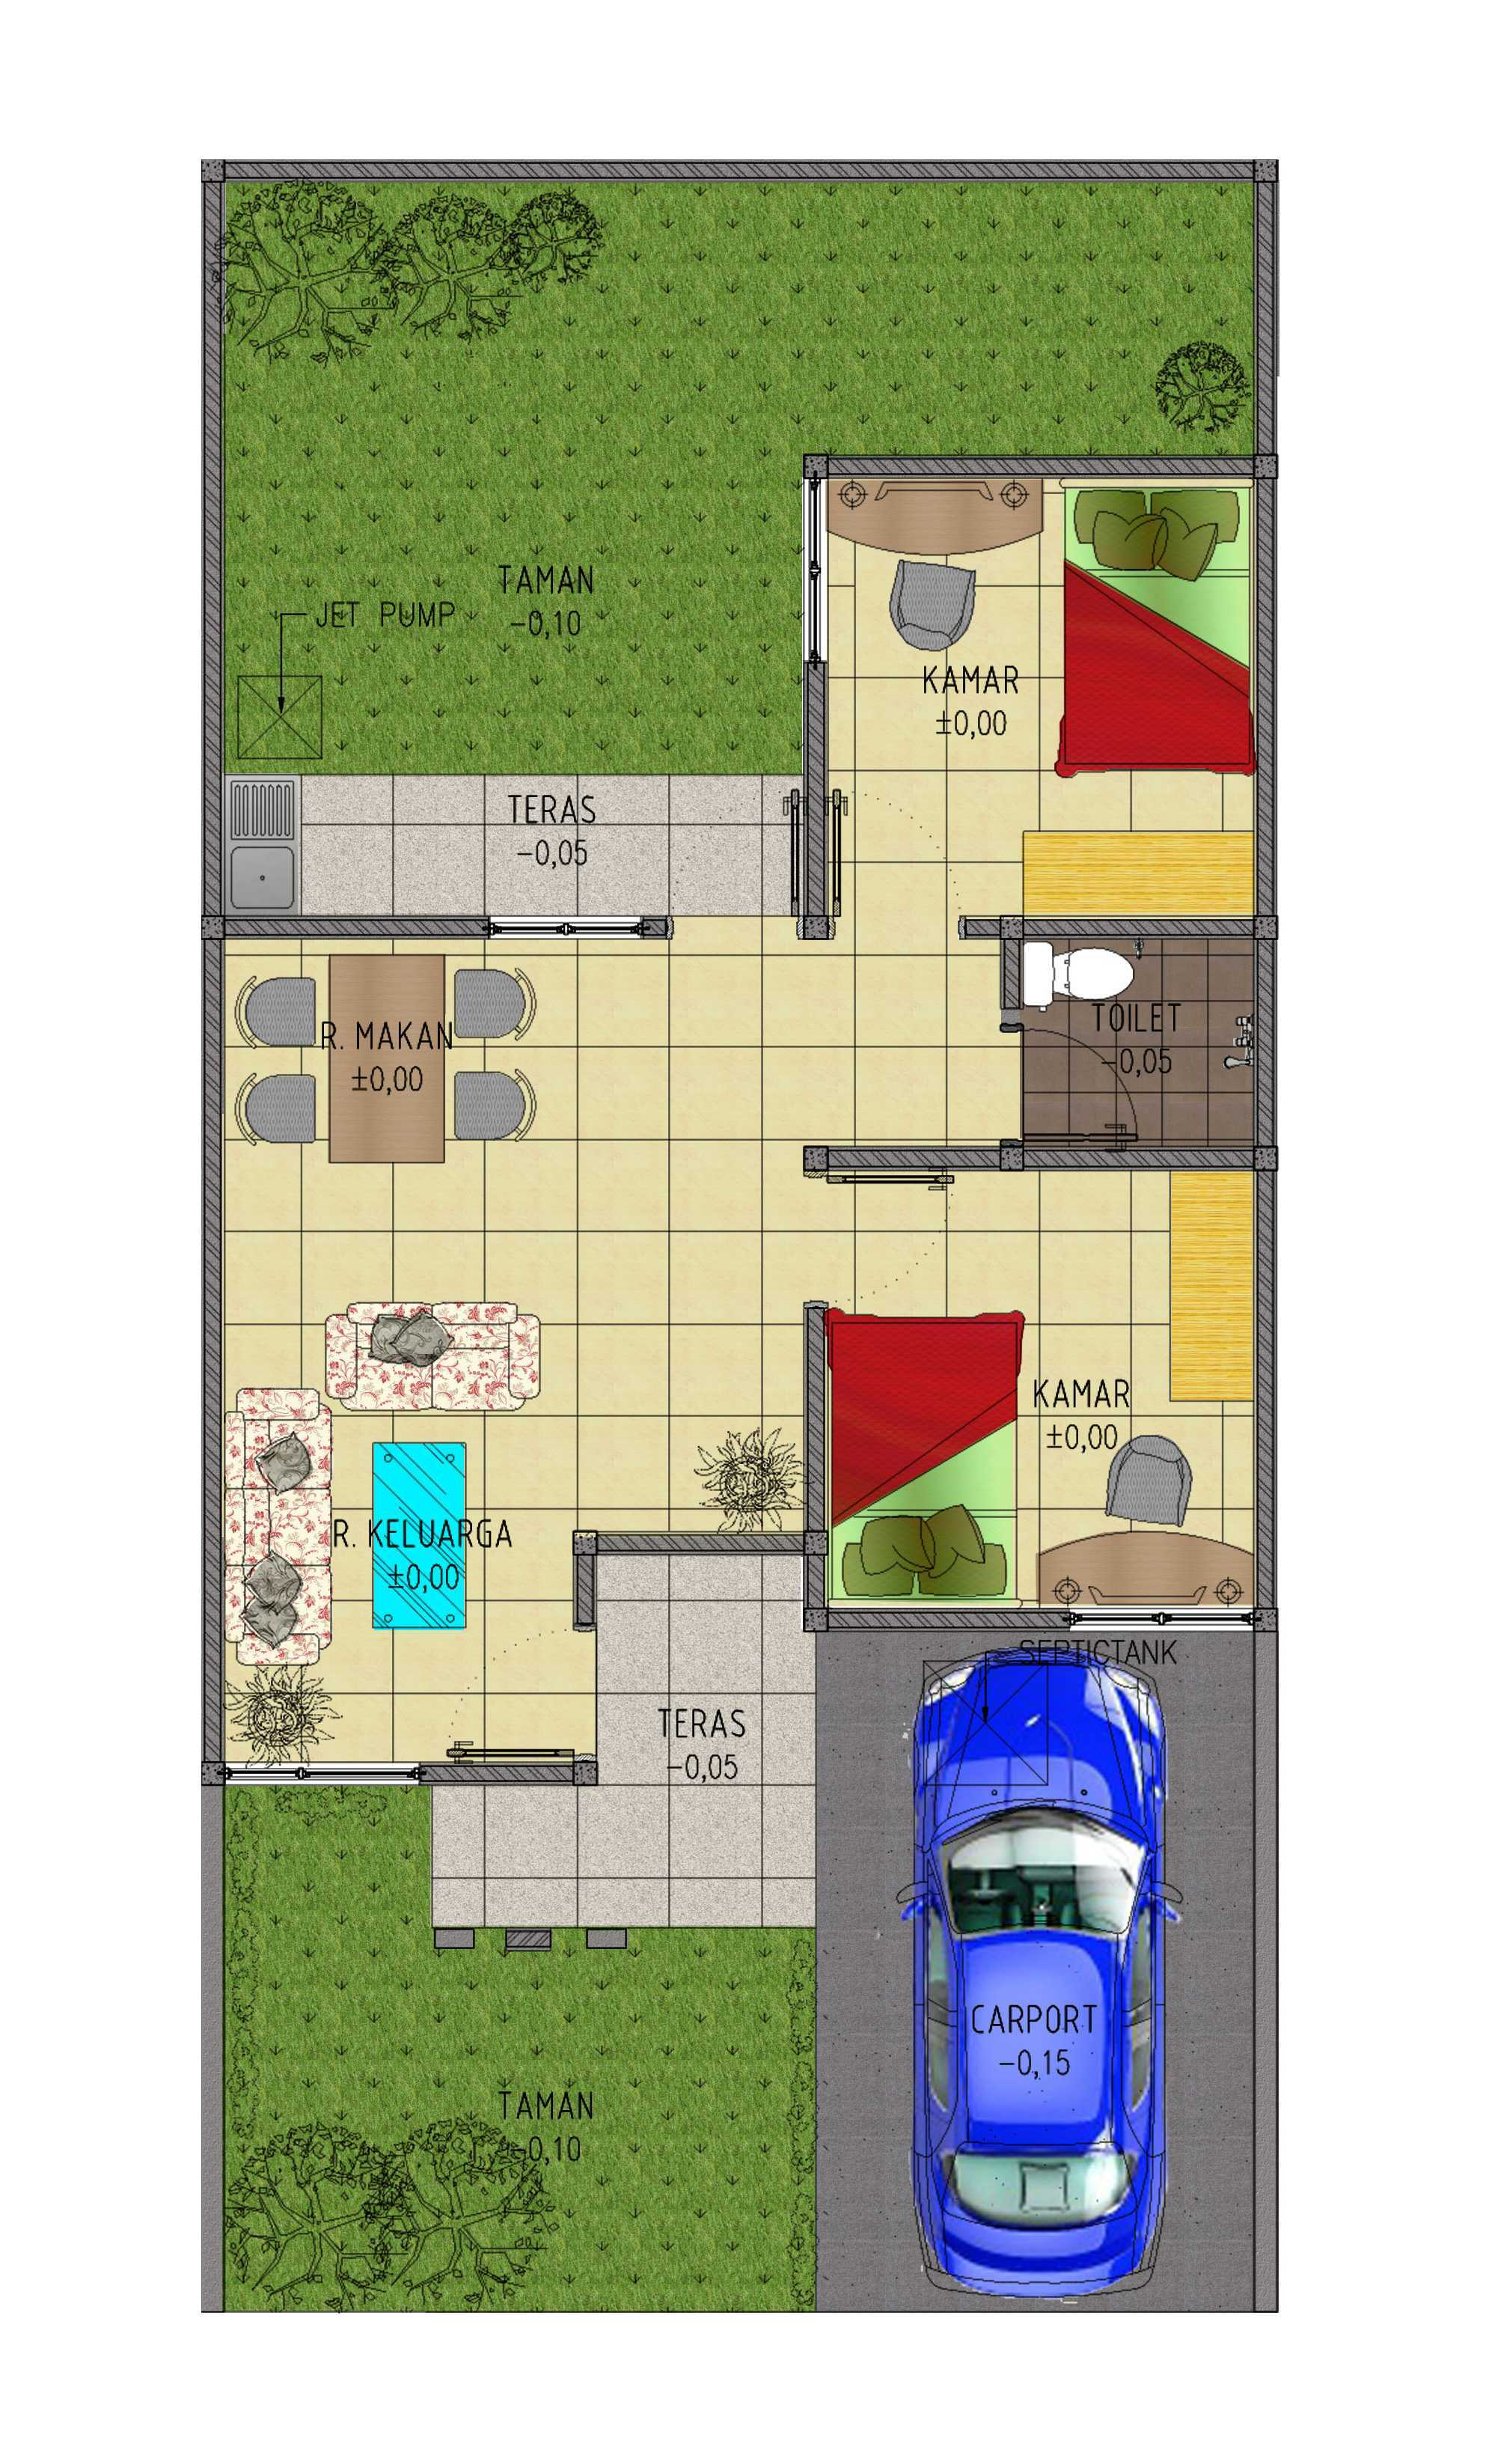 Gubah Ruang Studio B Residence Jakarta, Daerah Khusus Ibukota Jakarta, Indonesia Jakarta, Daerah Khusus Ibukota Jakarta, Indonesia Floorplan   50700